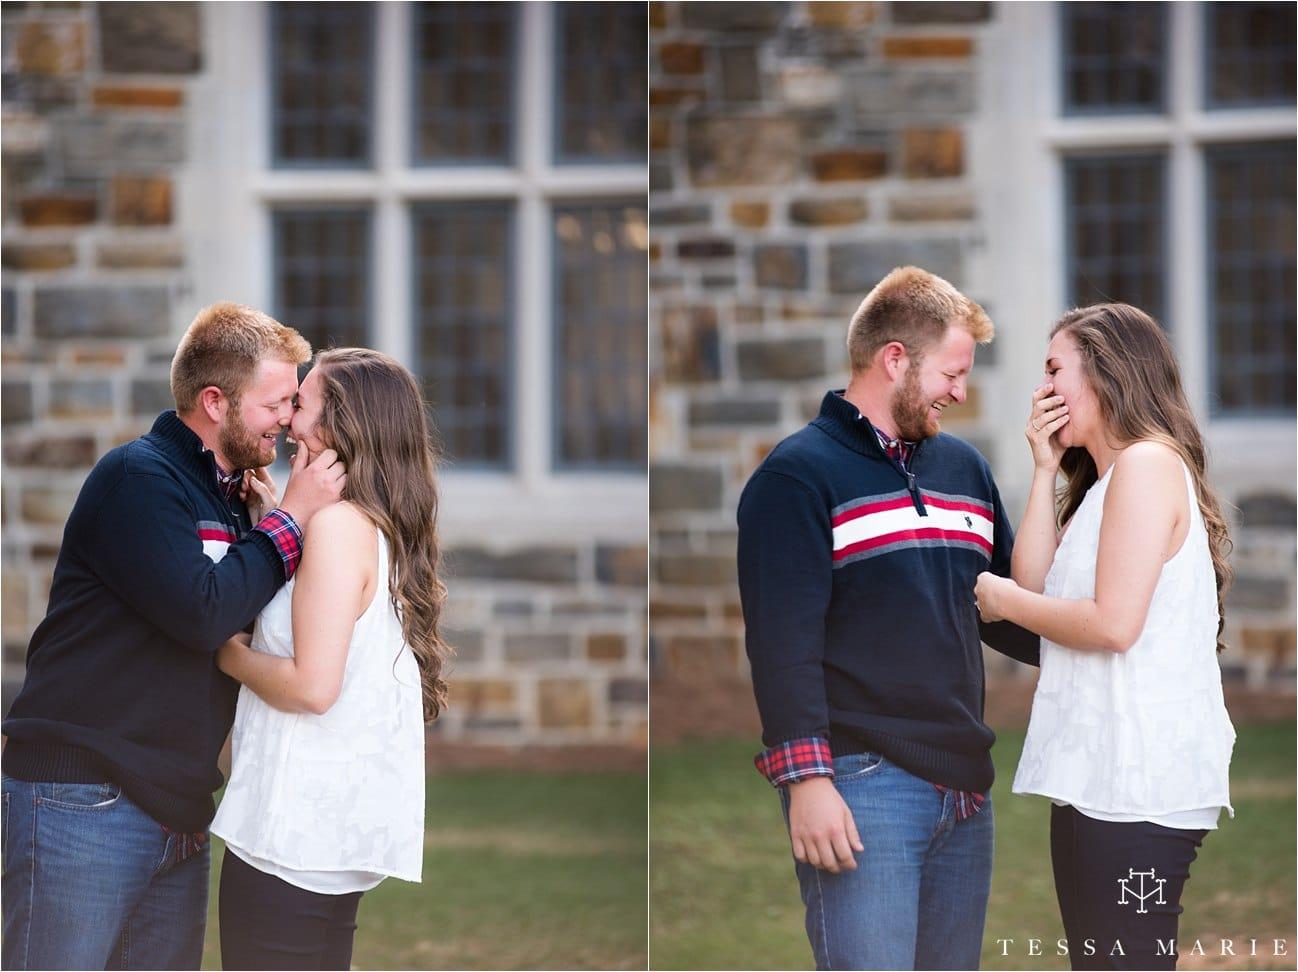 berry_college_engagement_pictures_tessa_marie_weddings_studios_0007